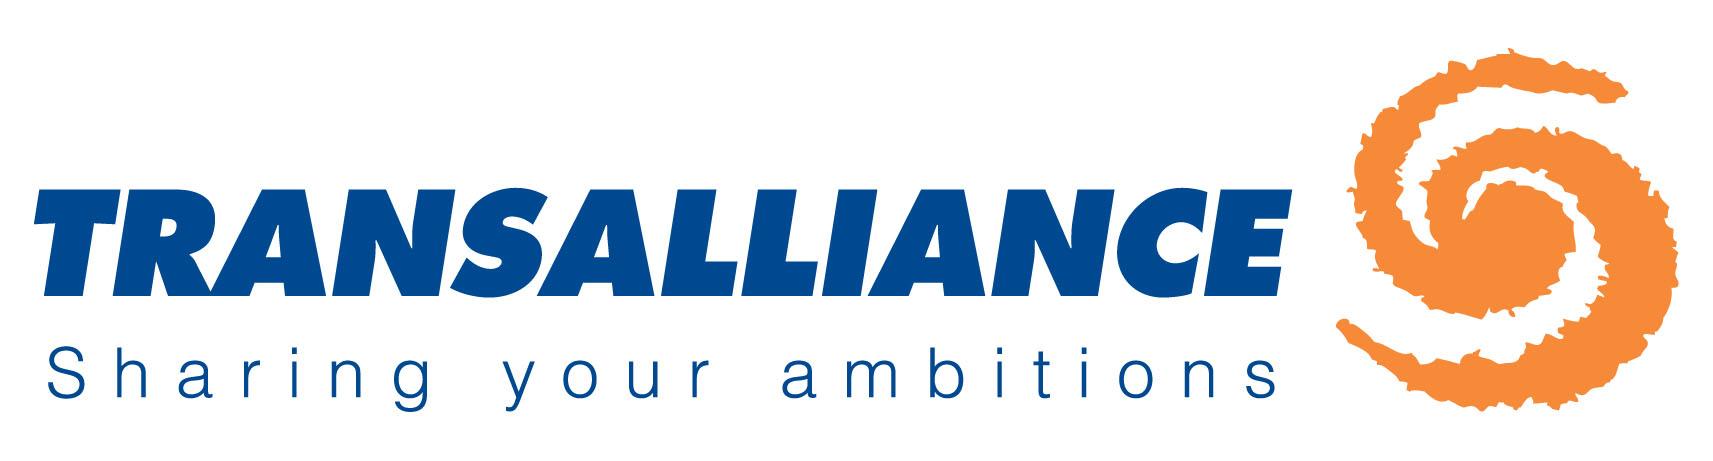 Logo of TRANSALLIANCE